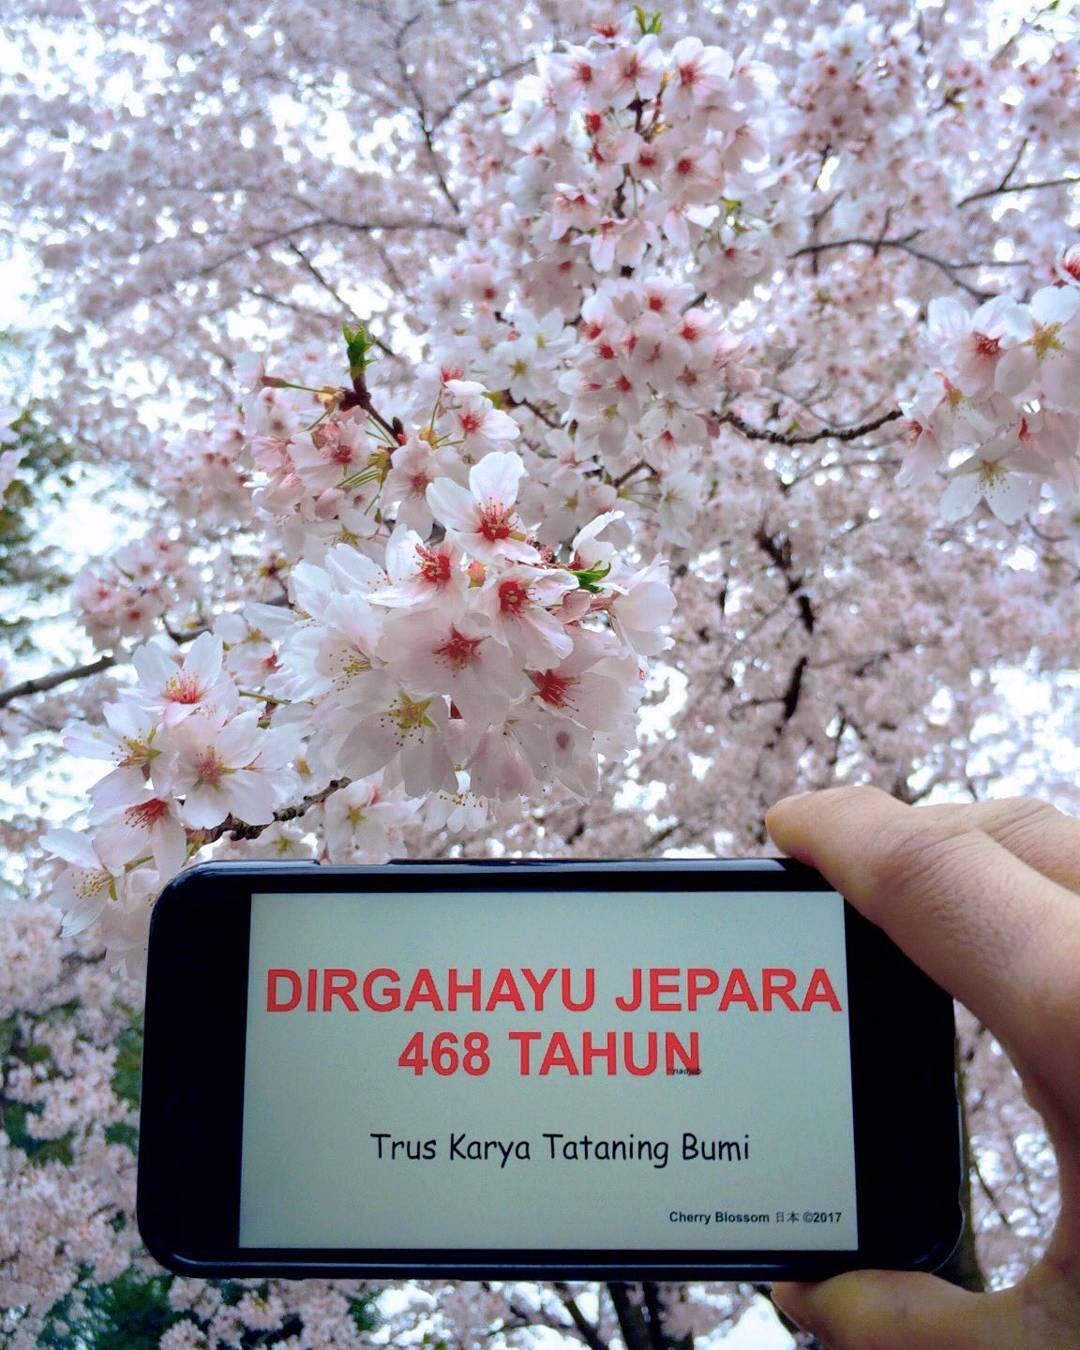 Ucapan Spesial Mas Nadjebs Dari Negeri Sakura Jepang Dirgahayu Jepara468 Instagram Posts How To Dry Basil Cherry Blossom